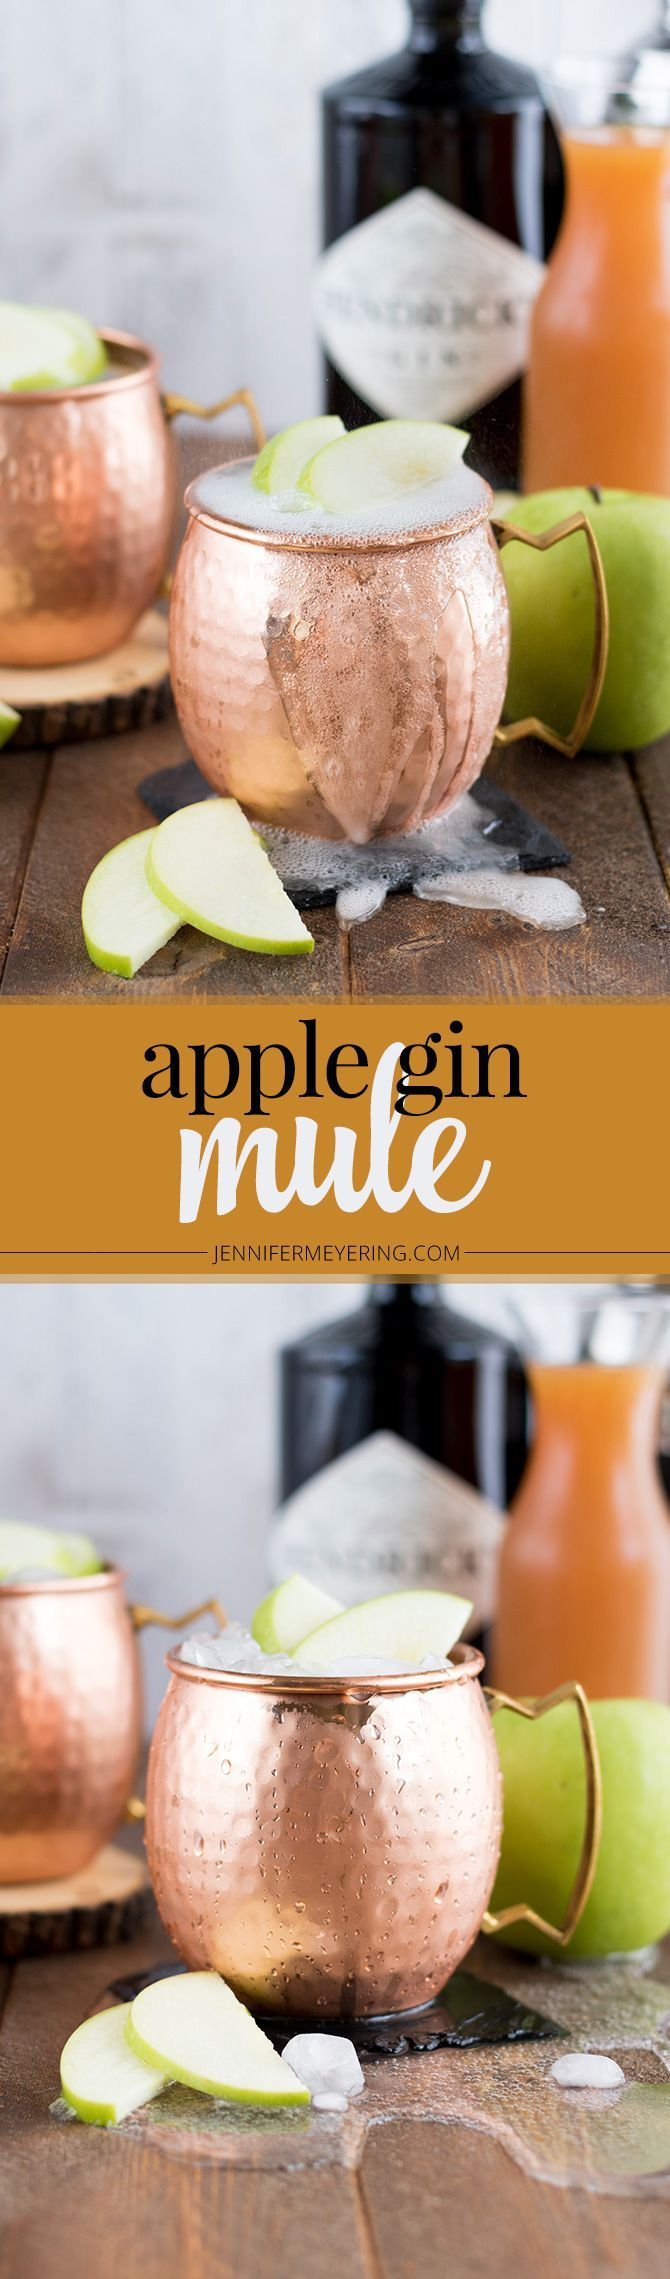 Apple Gin Mule - http://JenniferMeyering.com